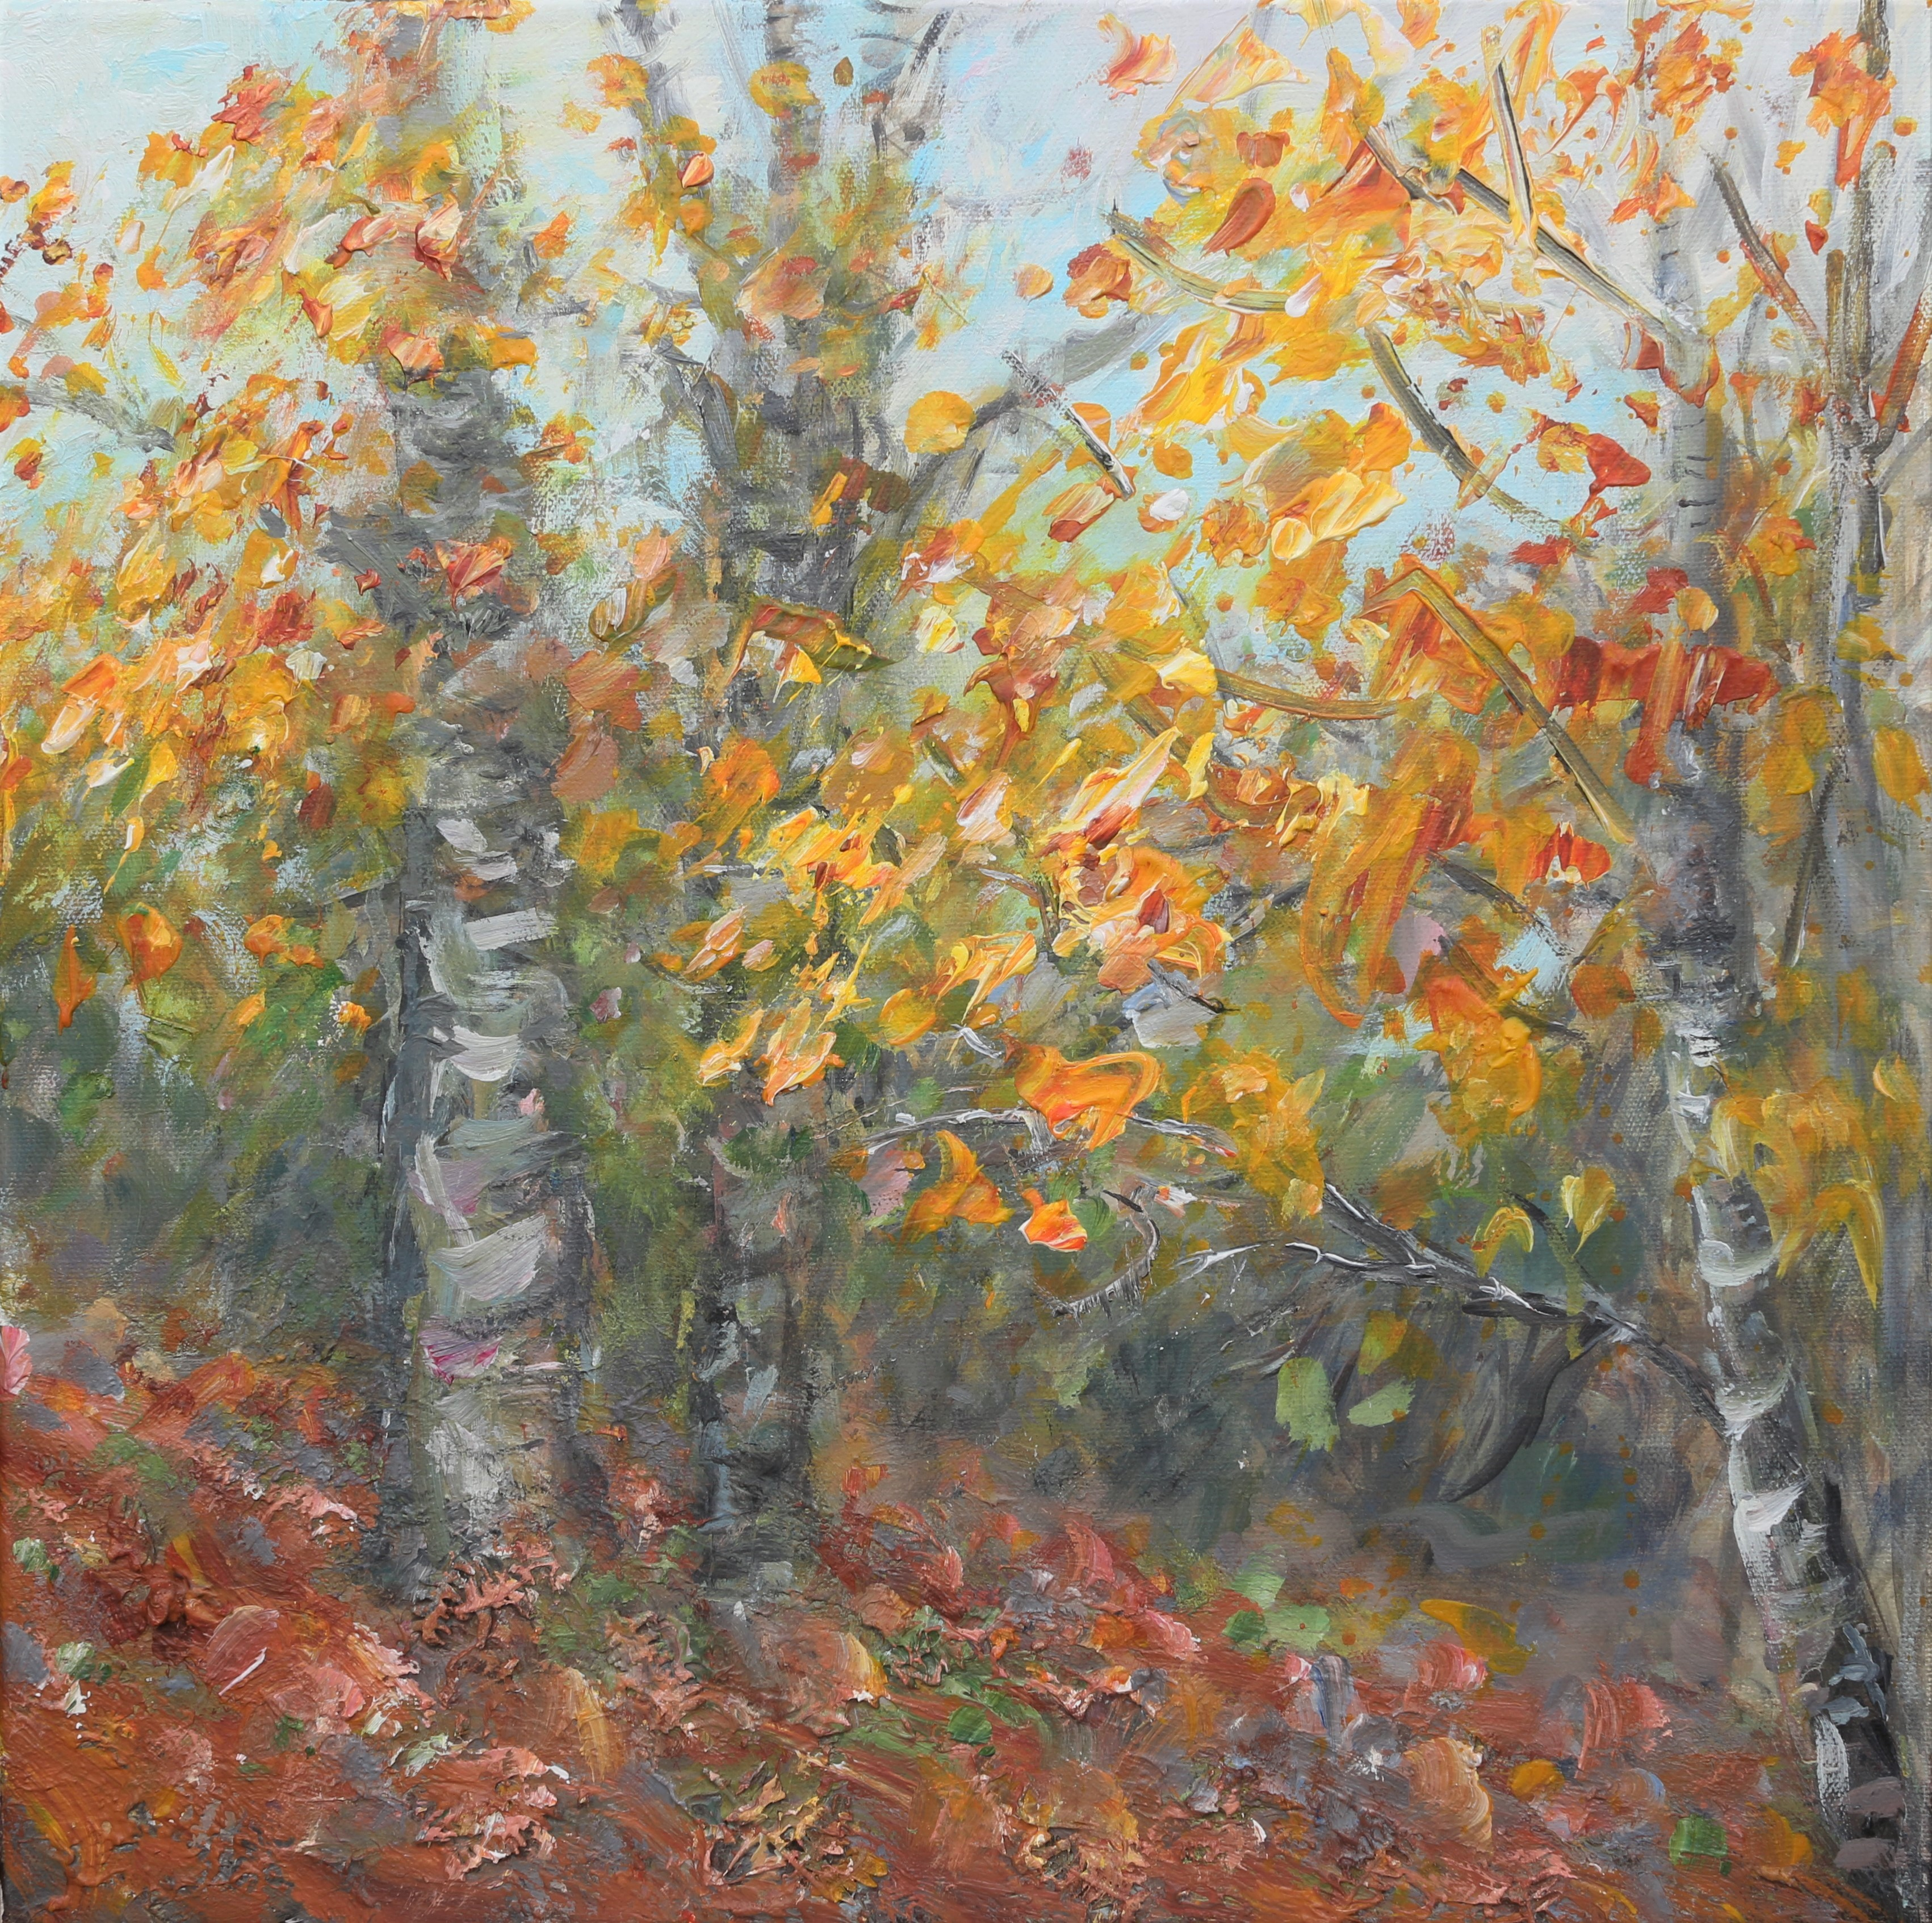 Autumn splendor 40x40cm